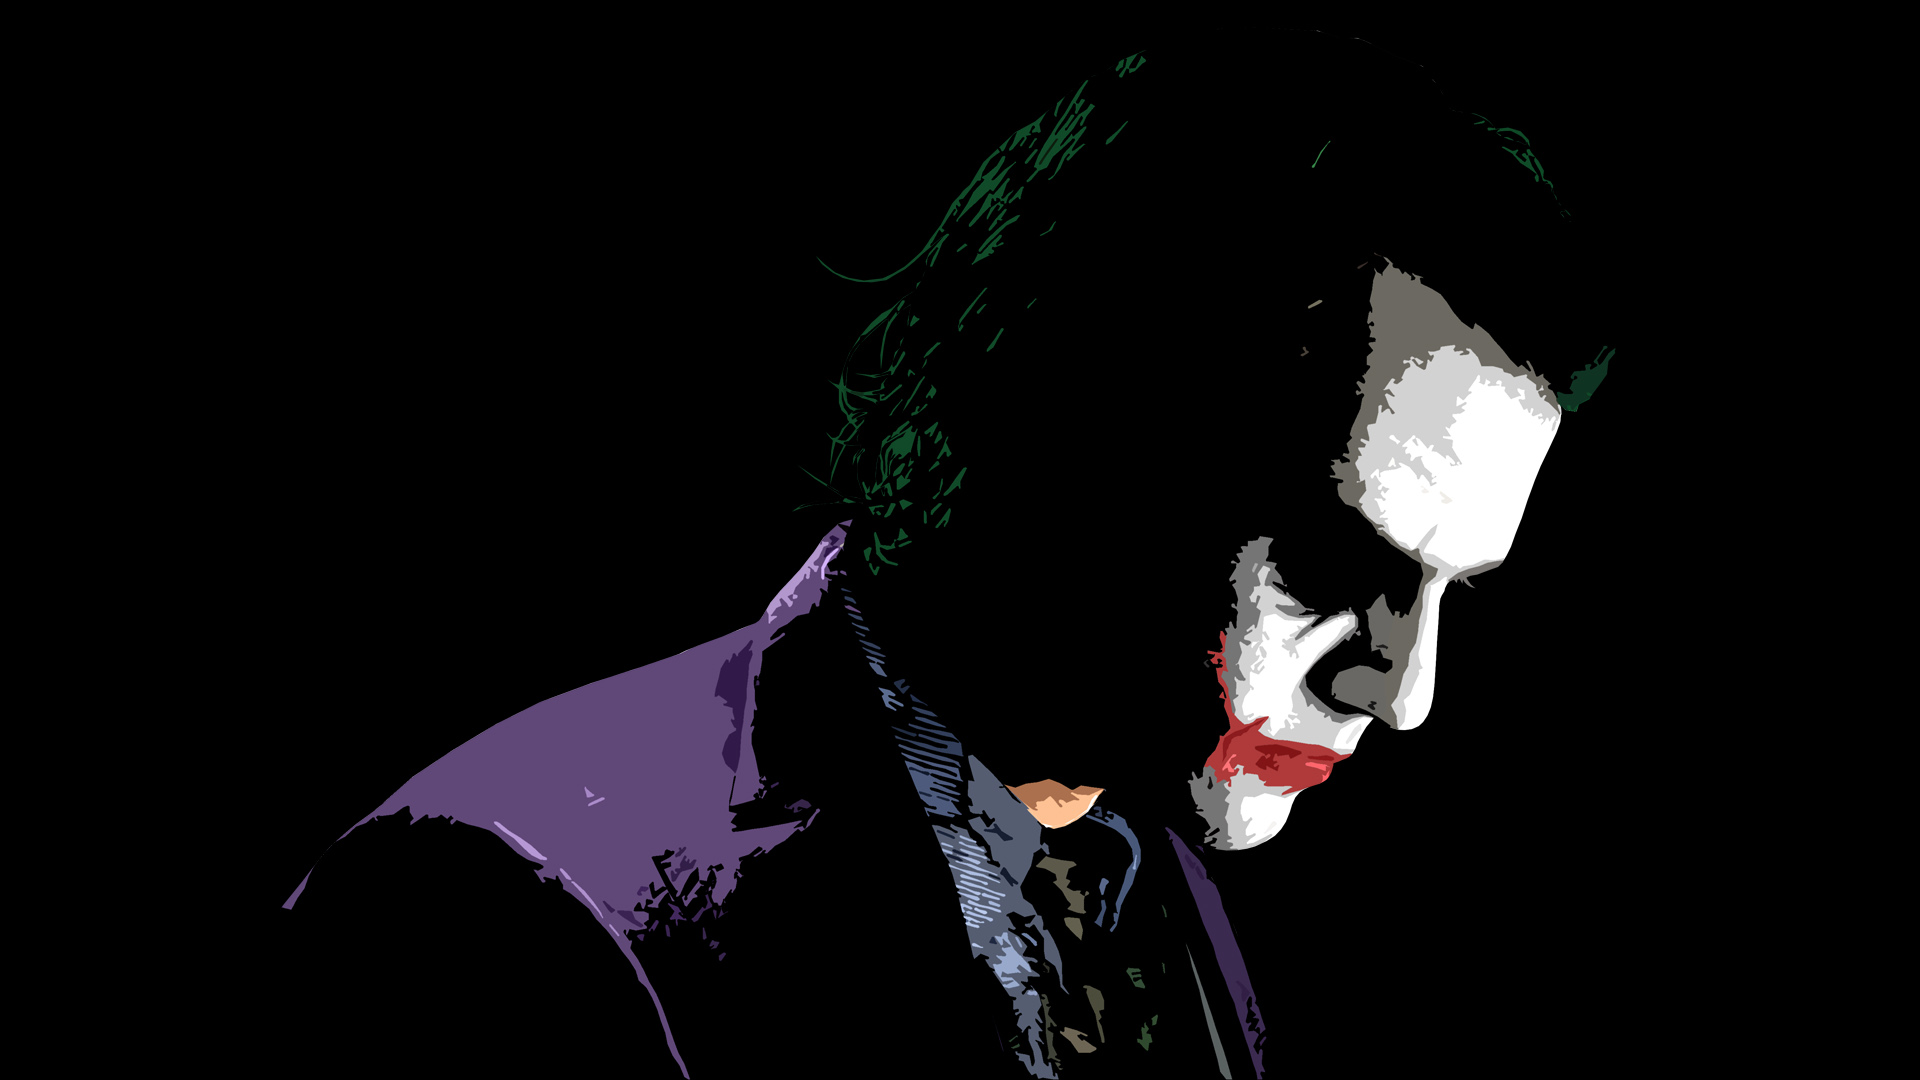 http://fc06.deviantart.net/fs70/f/2010/015/5/d/Joker_Wallpaper_by_Gjhdhgfgkutf.jpg